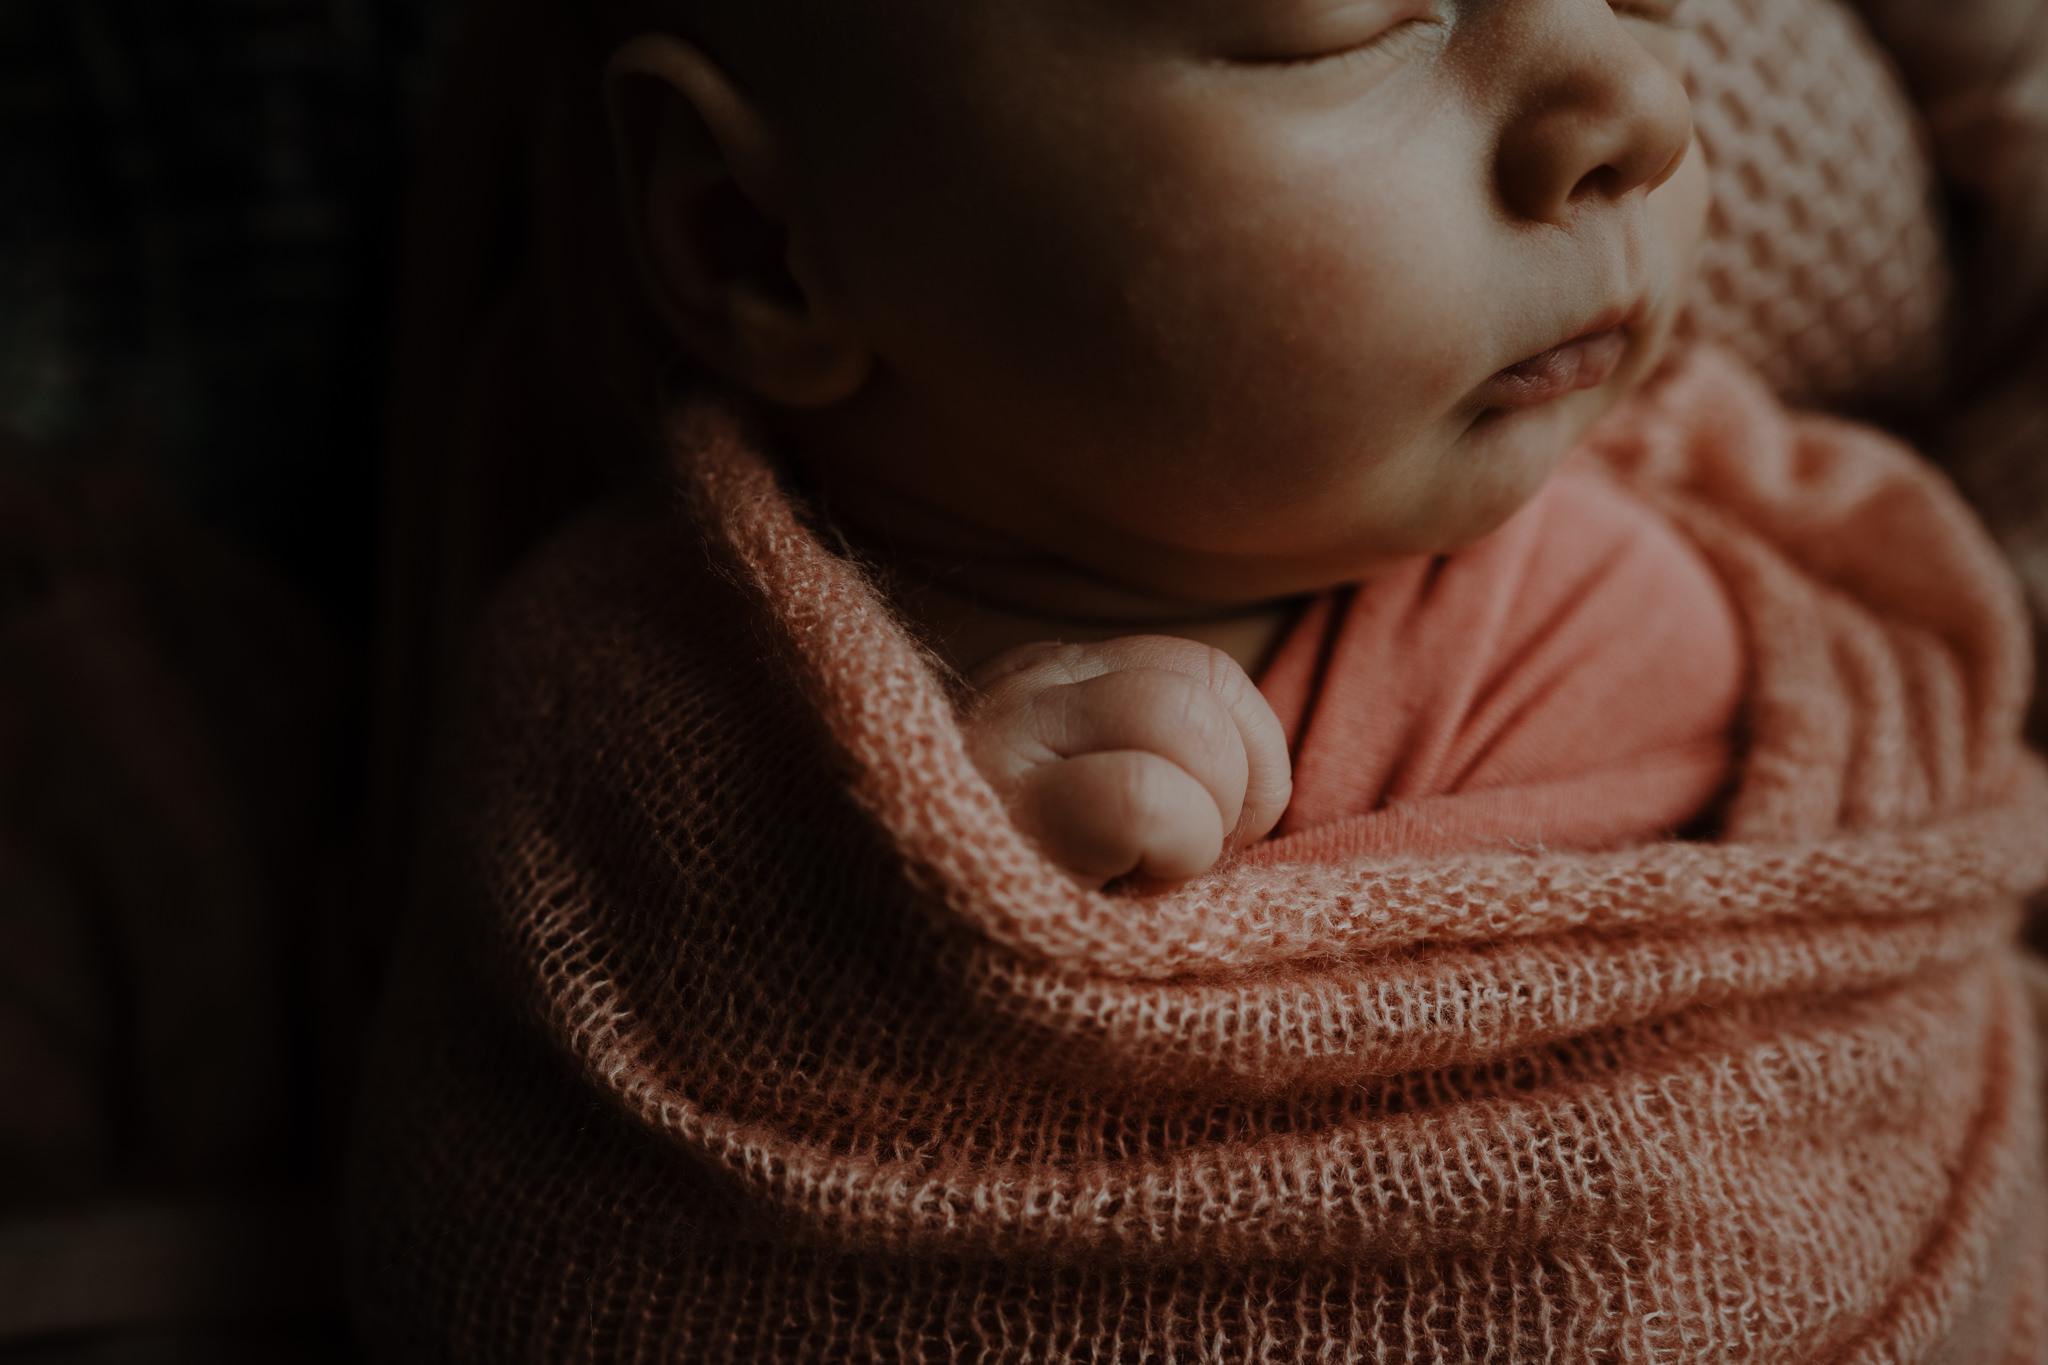 newborn-photographer-belfast-the-snug-sessions-Nora-22.jpg